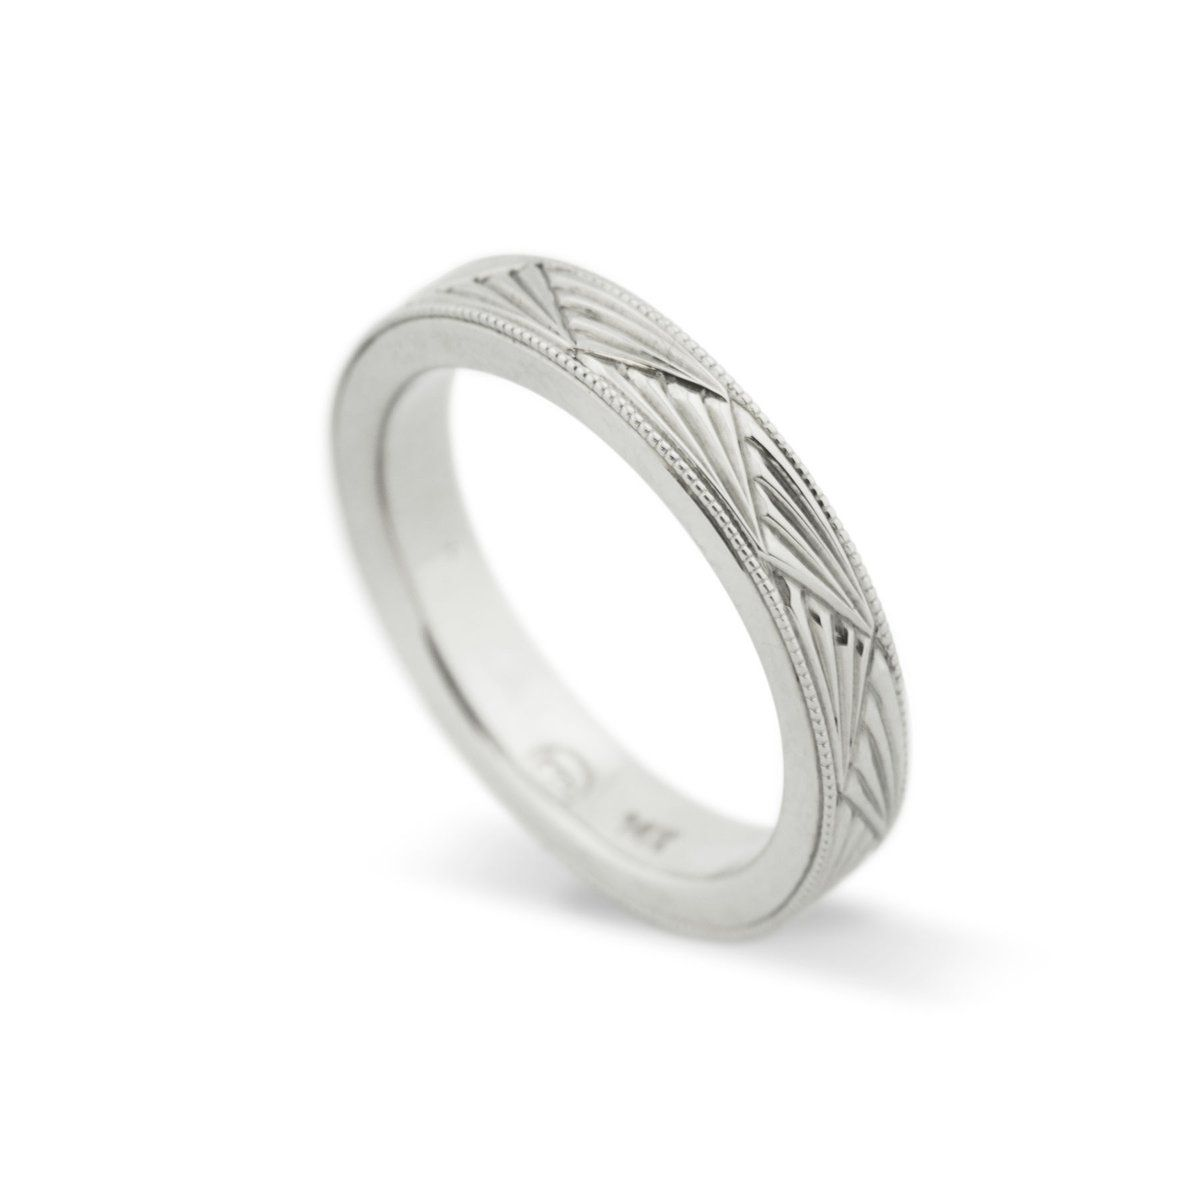 Handcrafted Art Deco Style Wedding Ring Hand Engraved Fan Pattern Millgrain Edges Custom Desi Hand Engraved Rings Vintage Style Wedding Rings Gold Art Deco